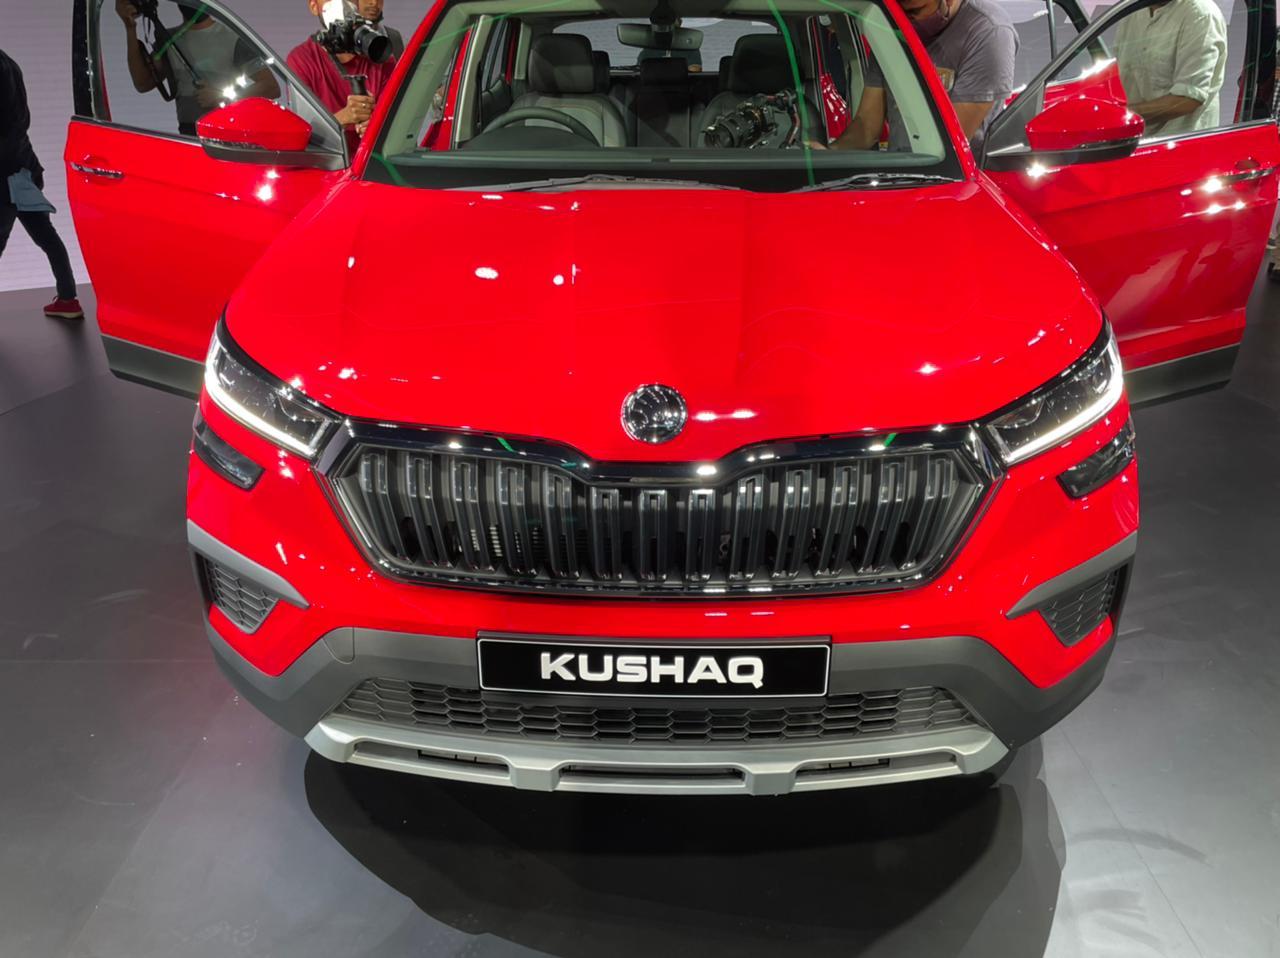 skoda-kushaq-features-review